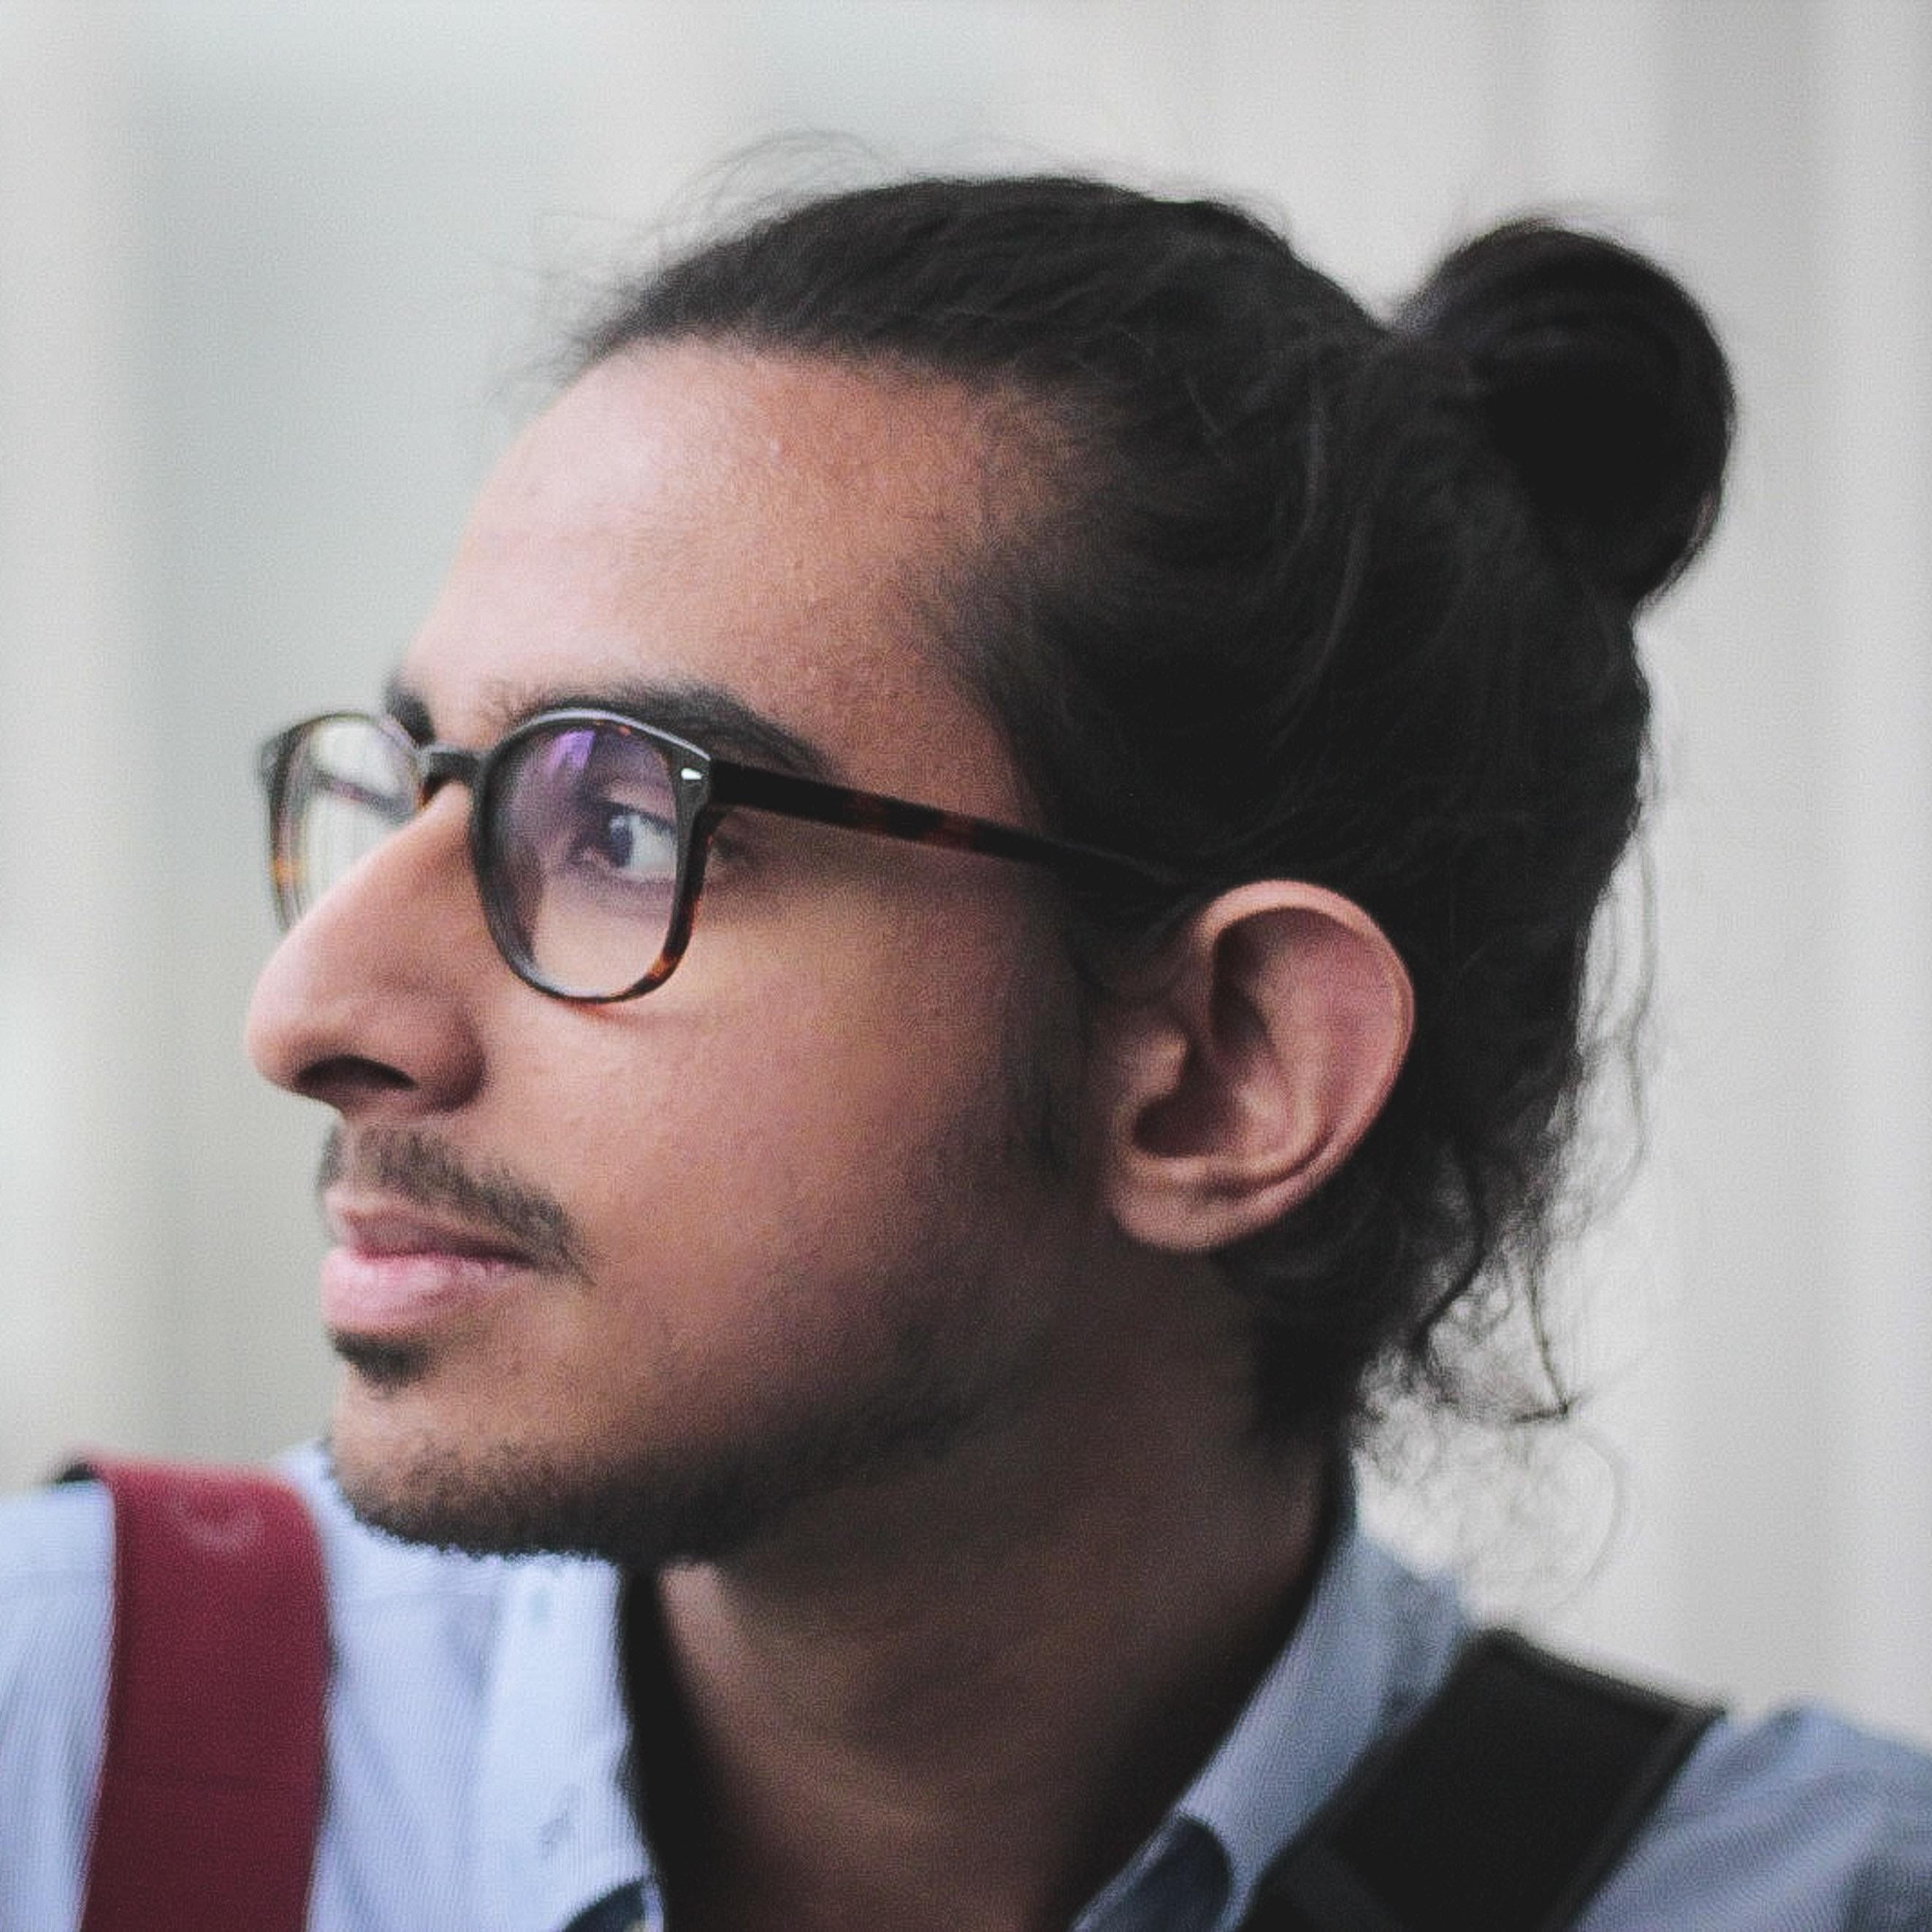 Avatar of user Shubhankar Sharma